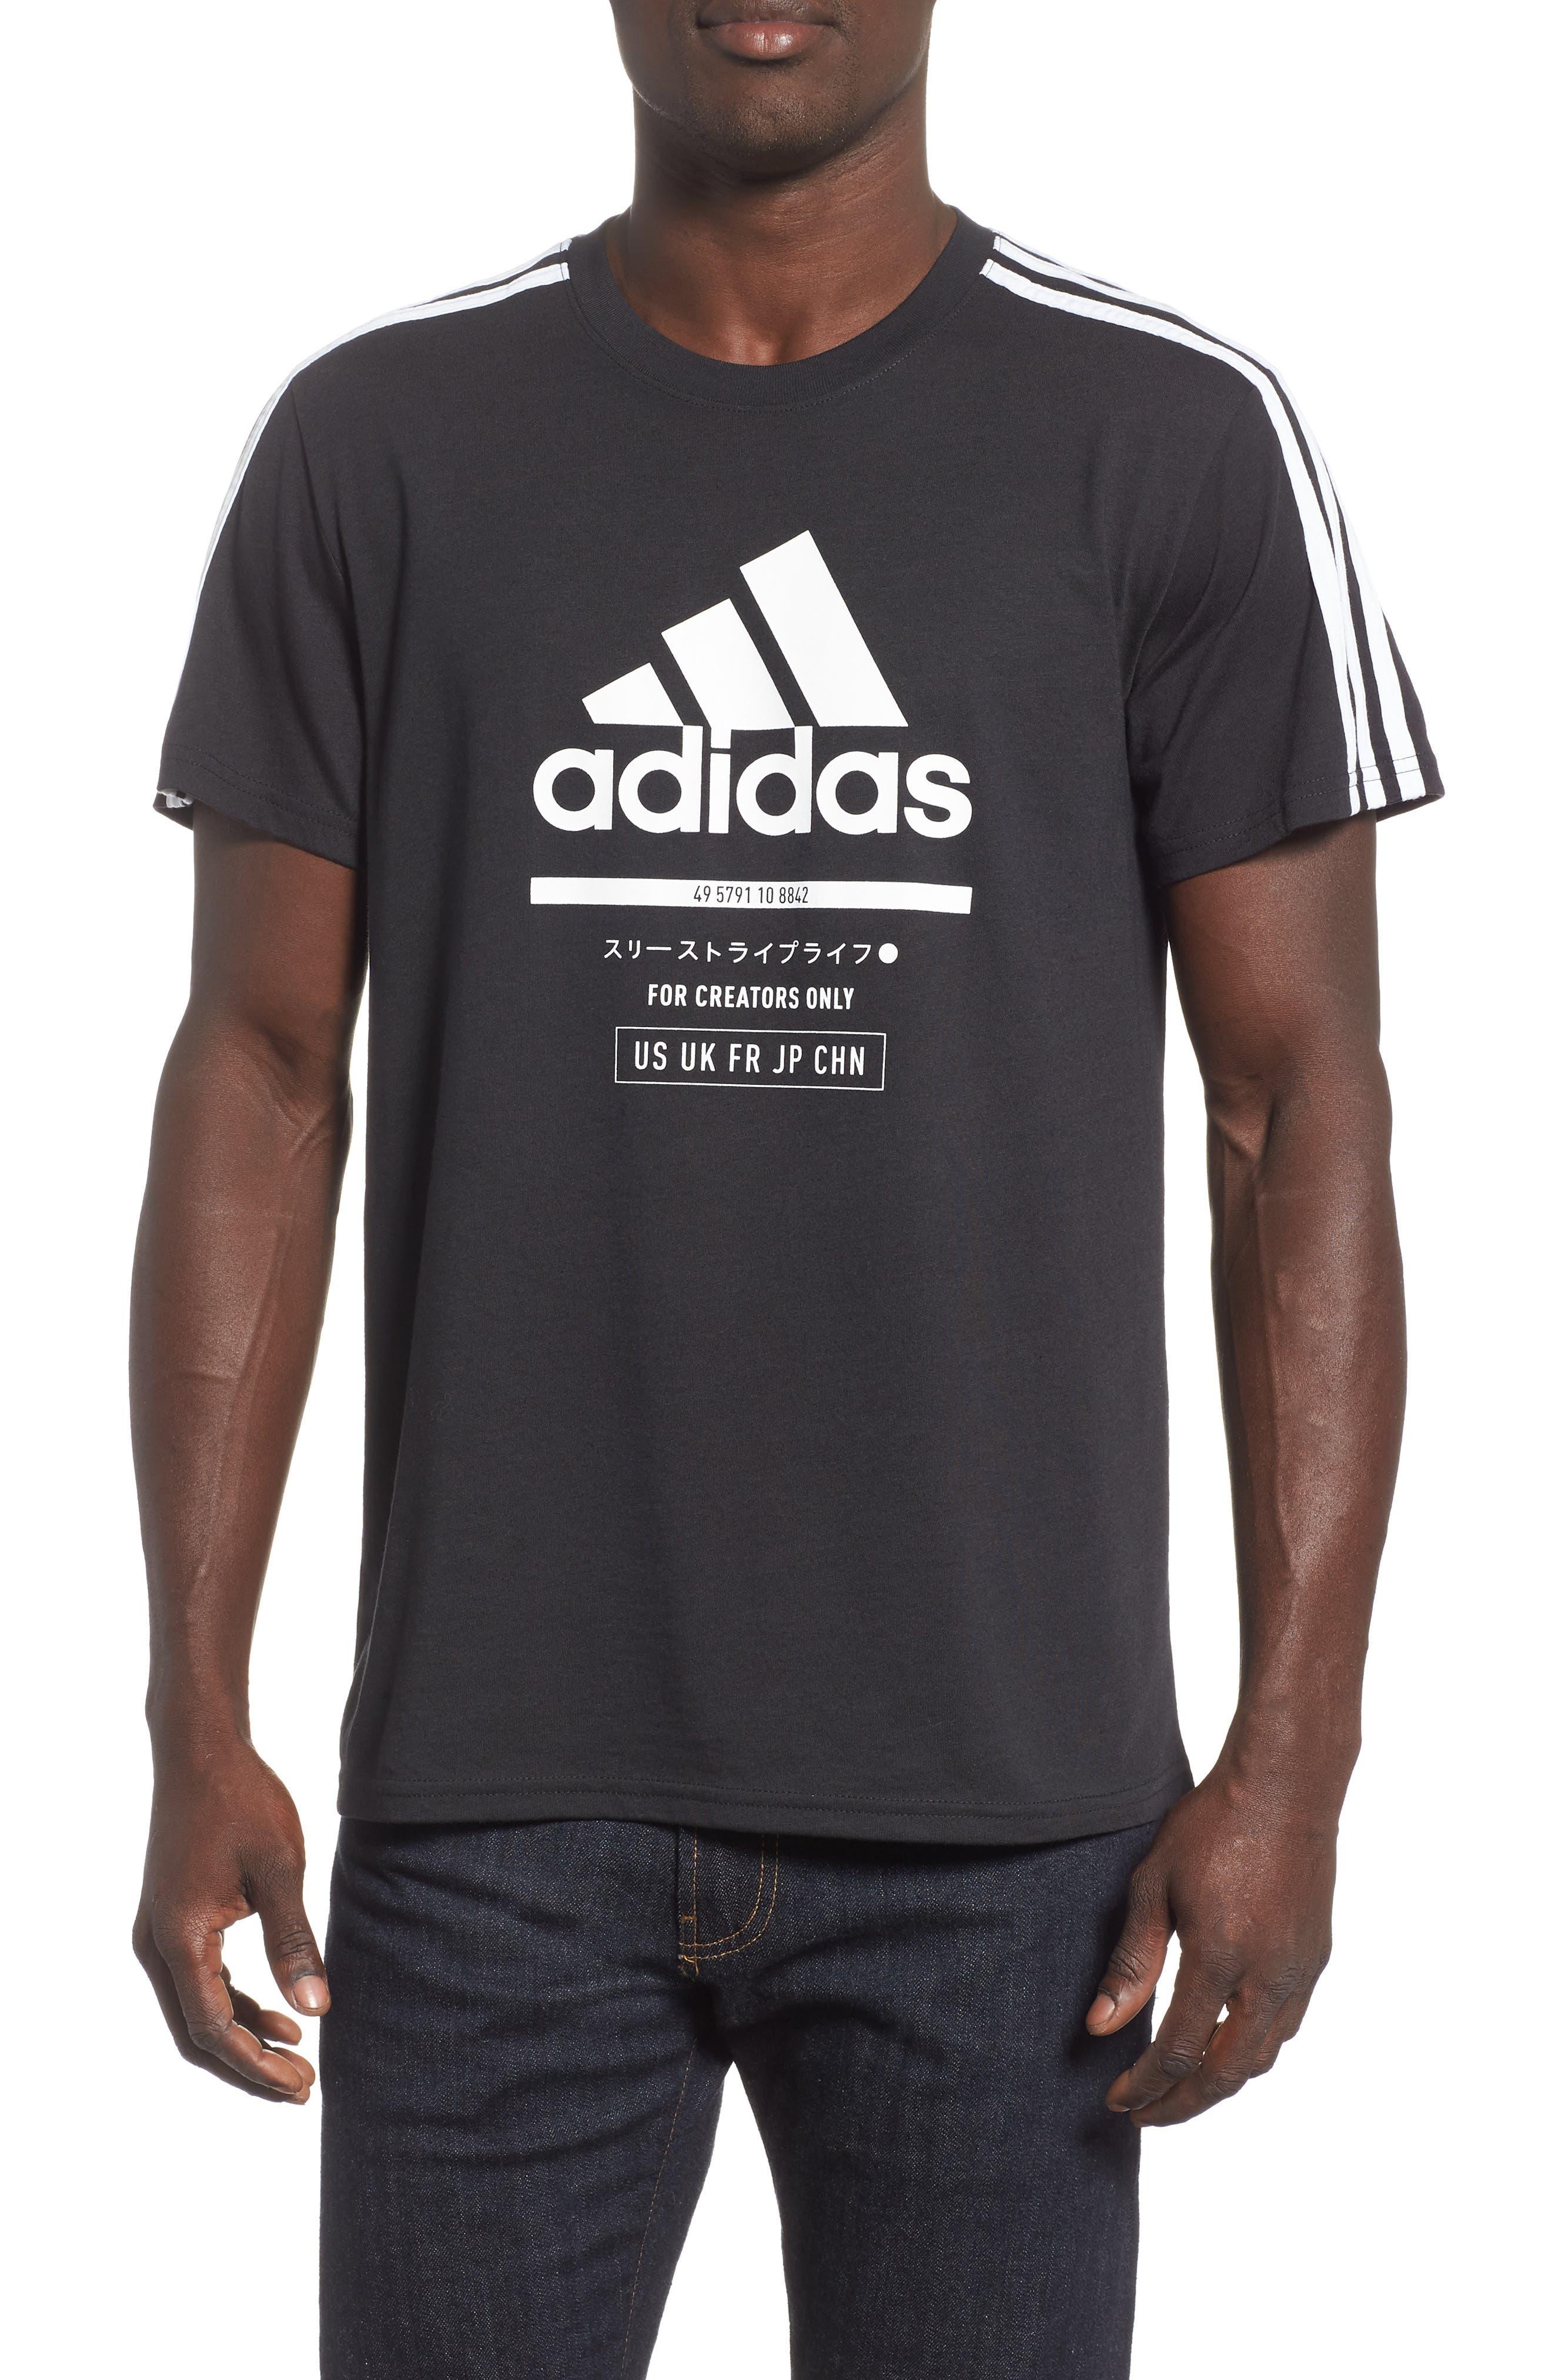 Adidas Classic International Regular Fit T-Shirt, Black